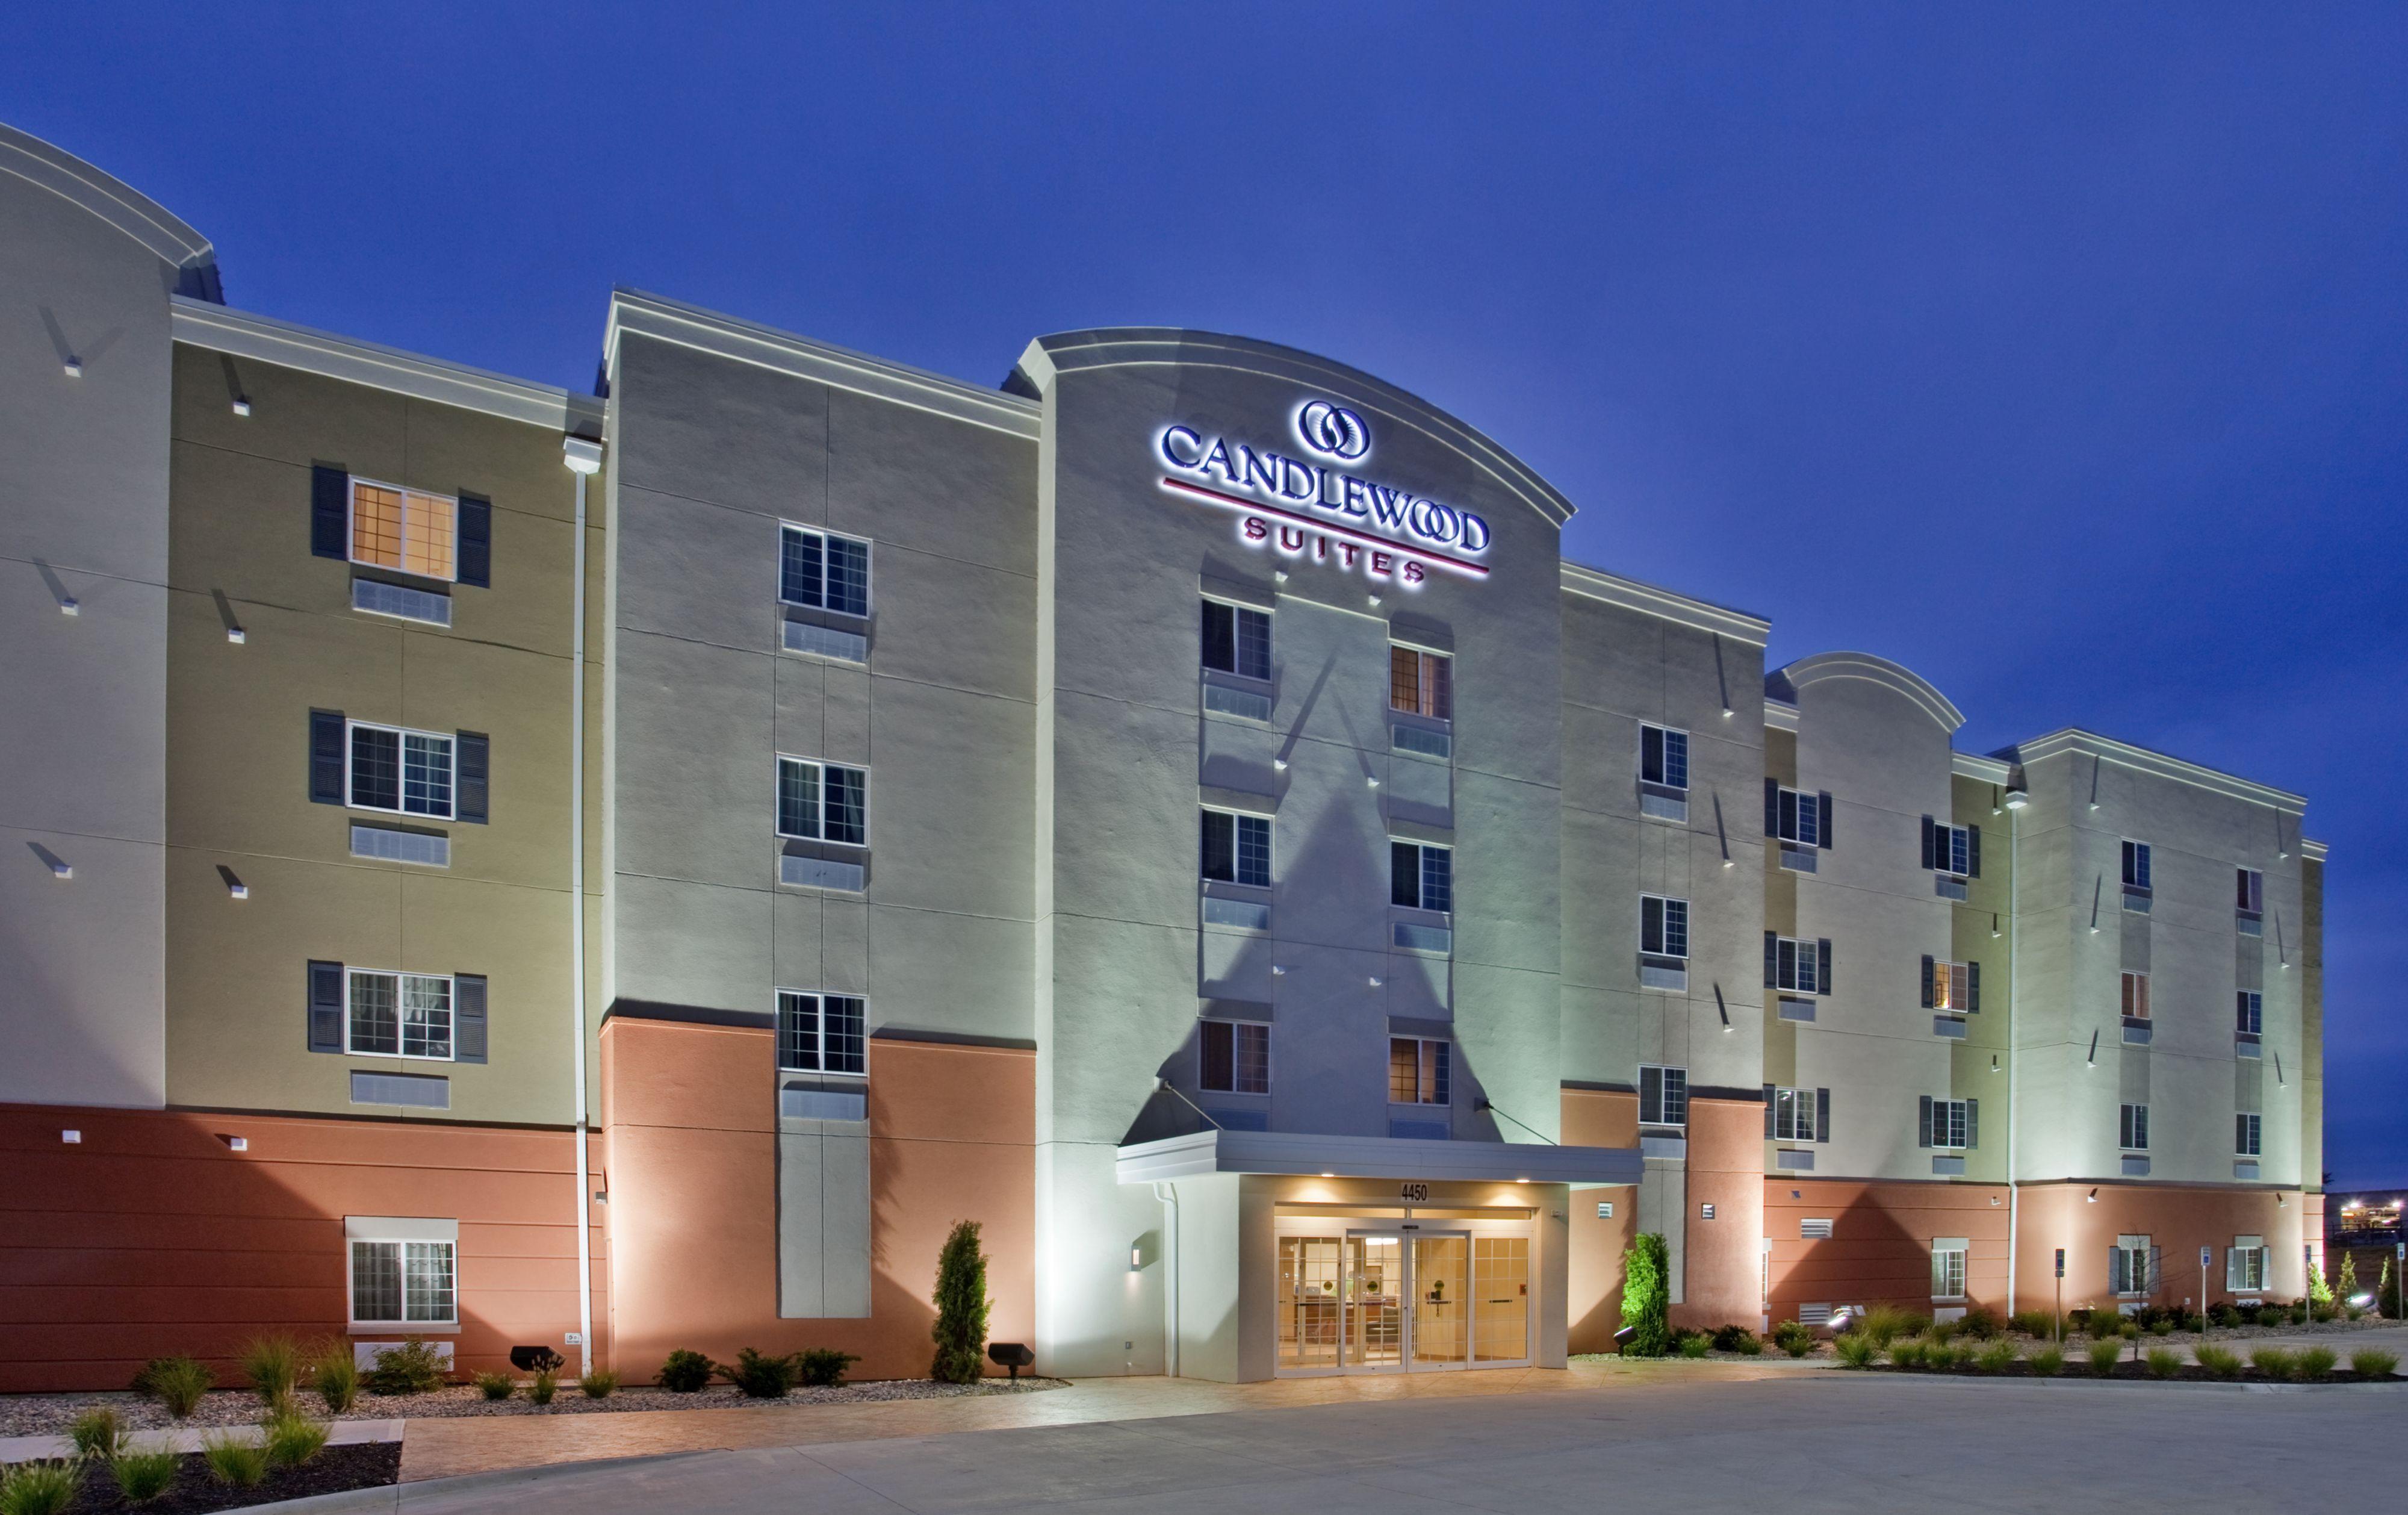 Candlewood Suites Jonesboro image 4